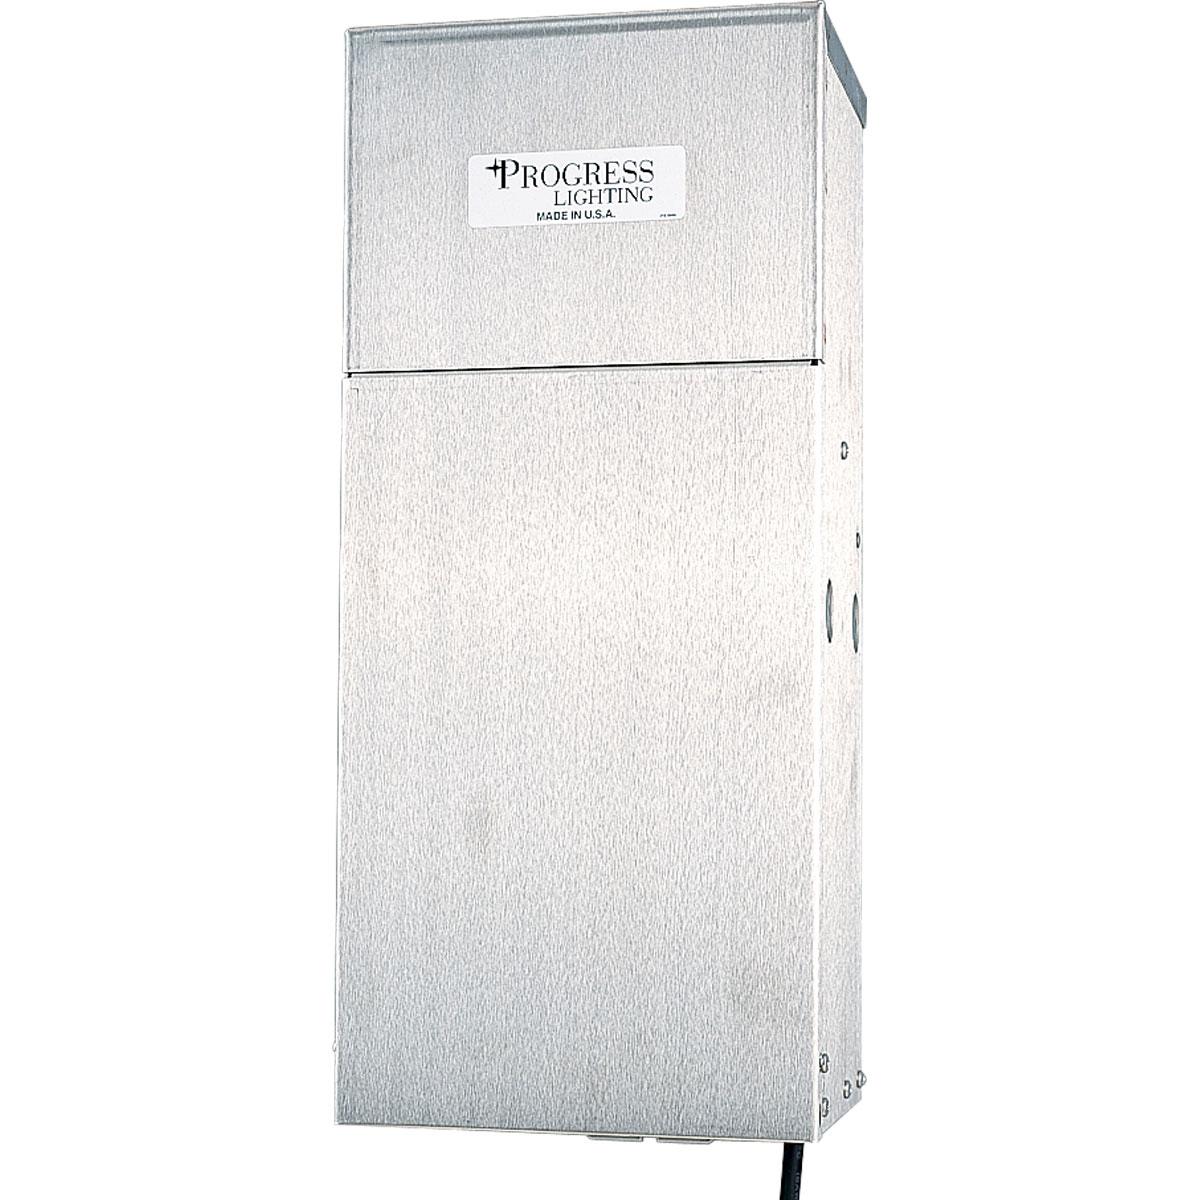 Progress Lighting® P8521-01 Commodity/Utilitarian Plug-In Landscape Transformer, 120 VAC Input, 12 VAC Output, 900 W